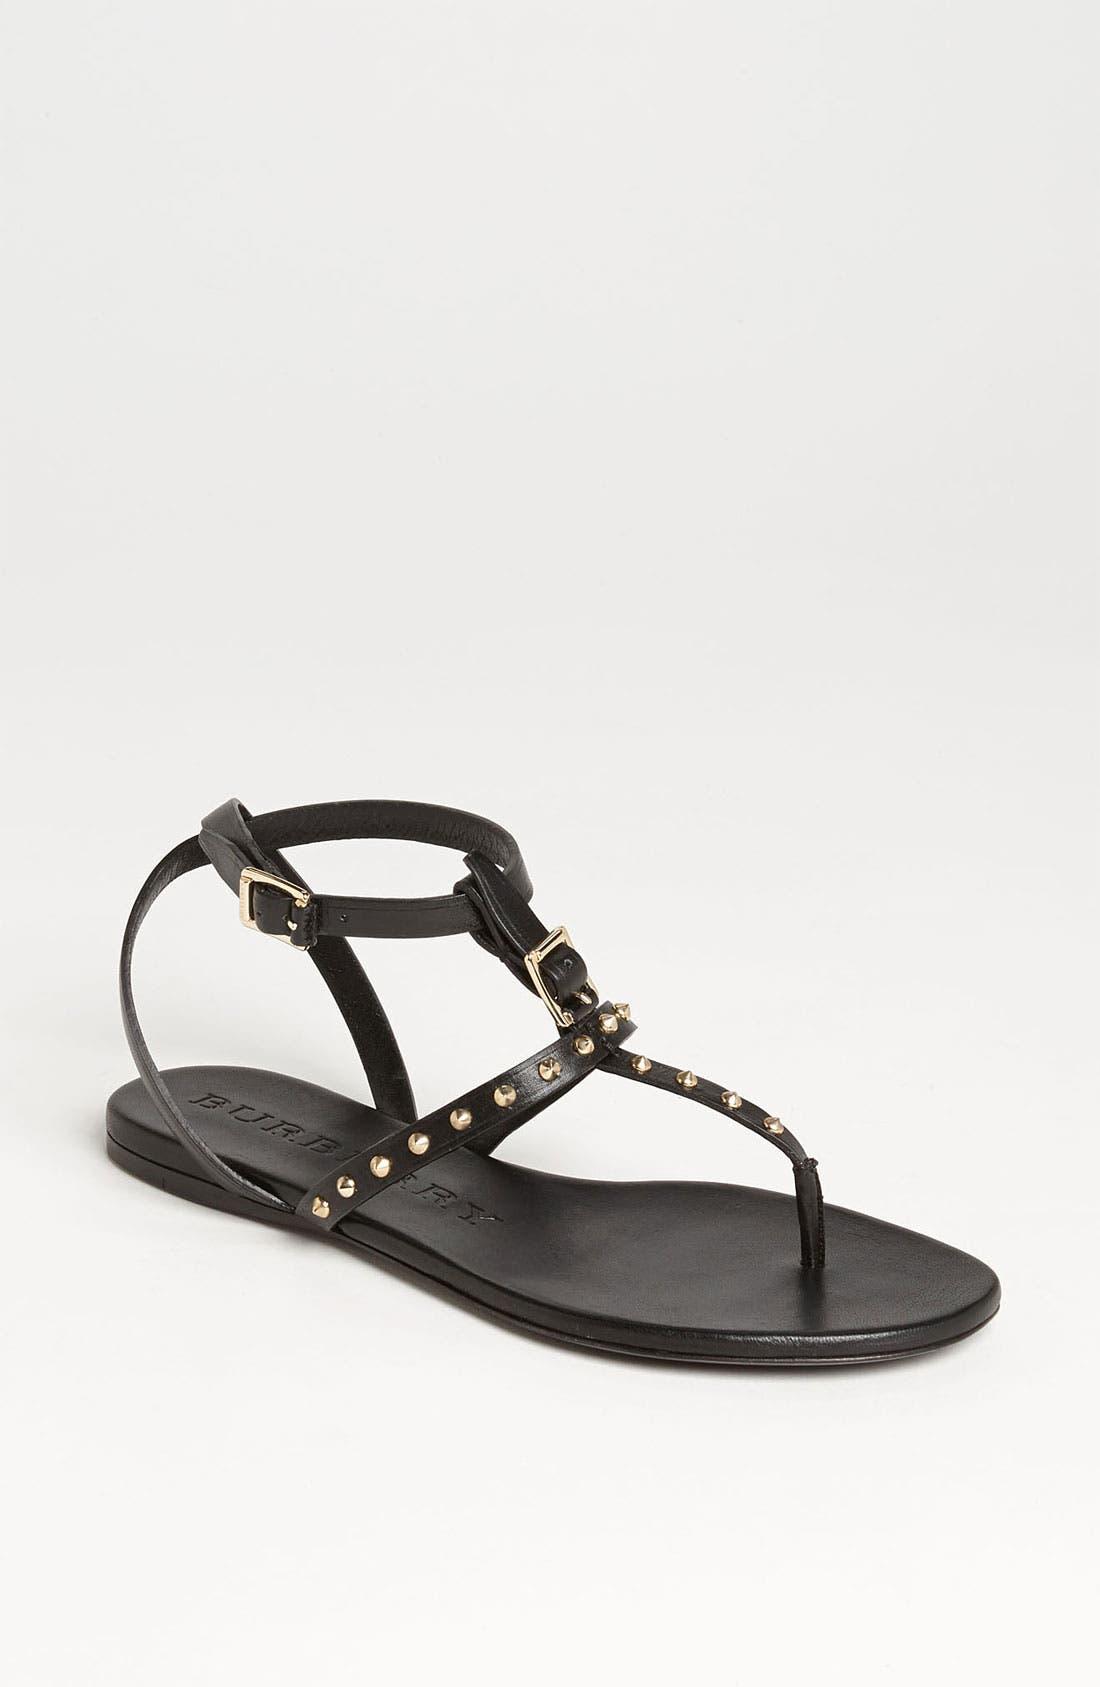 Alternate Image 1 Selected - Burberry 'Masefield' Sandal